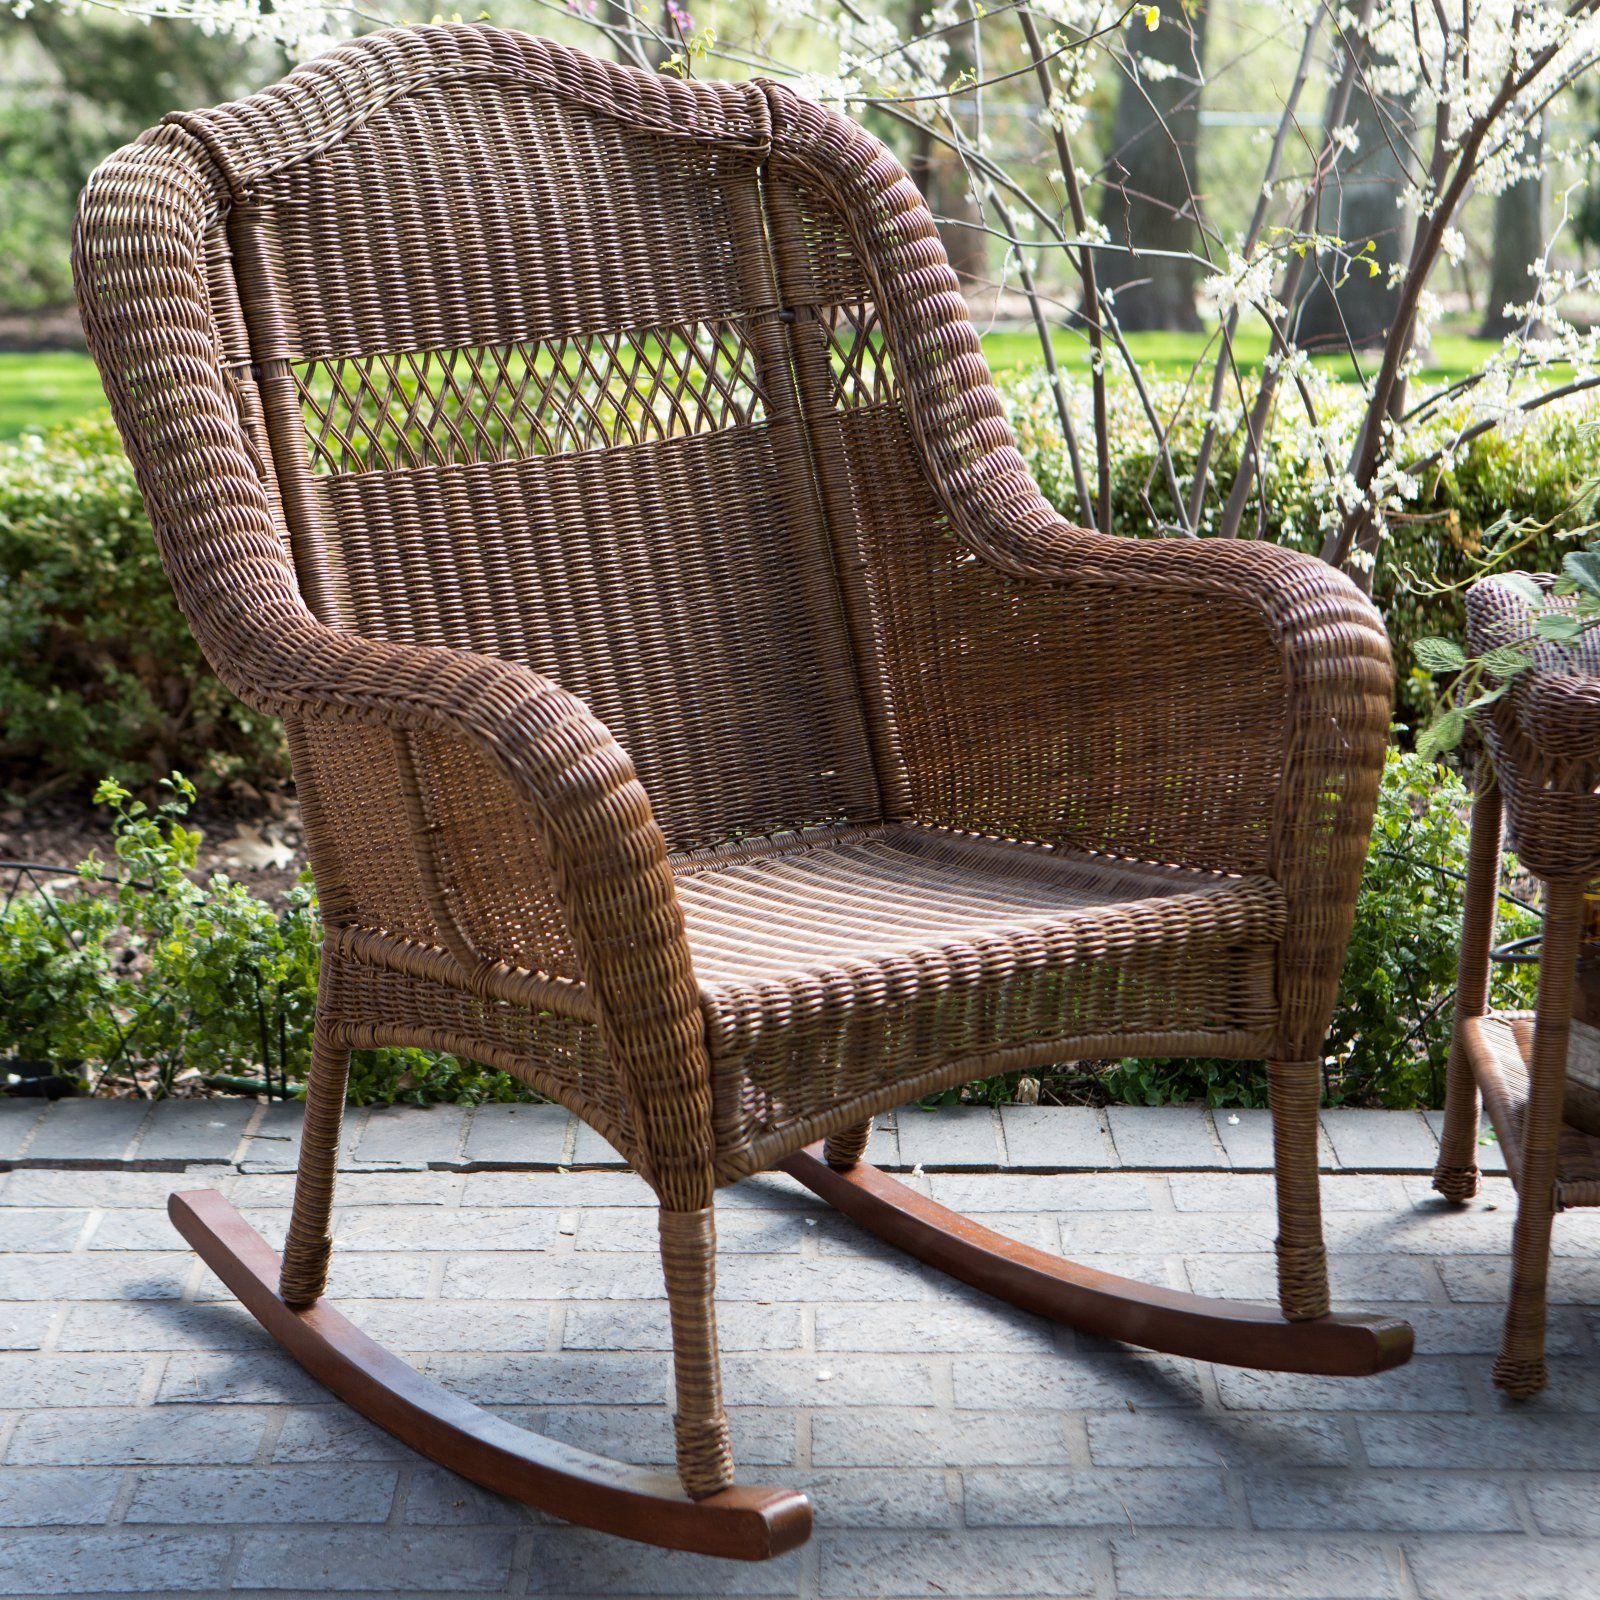 Amazing Outdoor Coral Coast Casco Bay Resin Wicker Rocking Chair Inzonedesignstudio Interior Chair Design Inzonedesignstudiocom